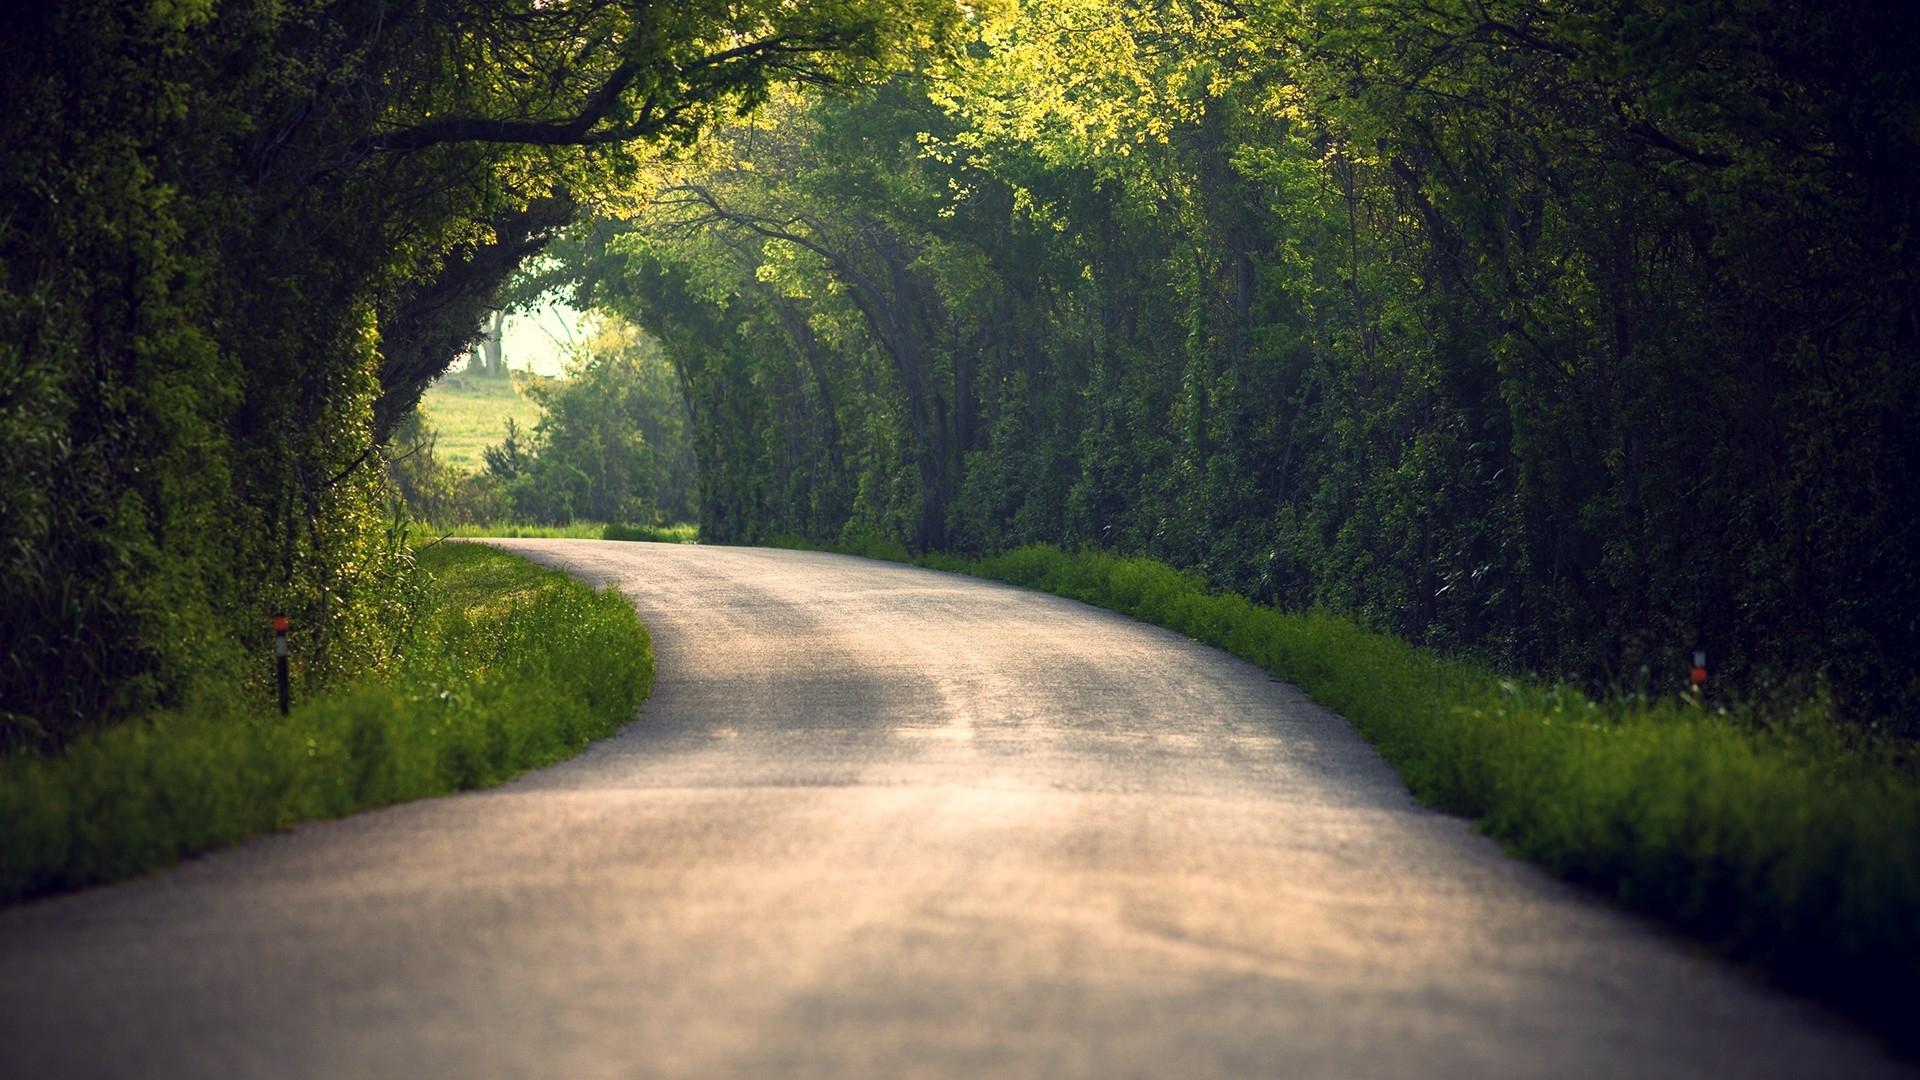 Wallpaper : sunlight, trees, landscape, forest, leaves, nature, grass, road, green, morning